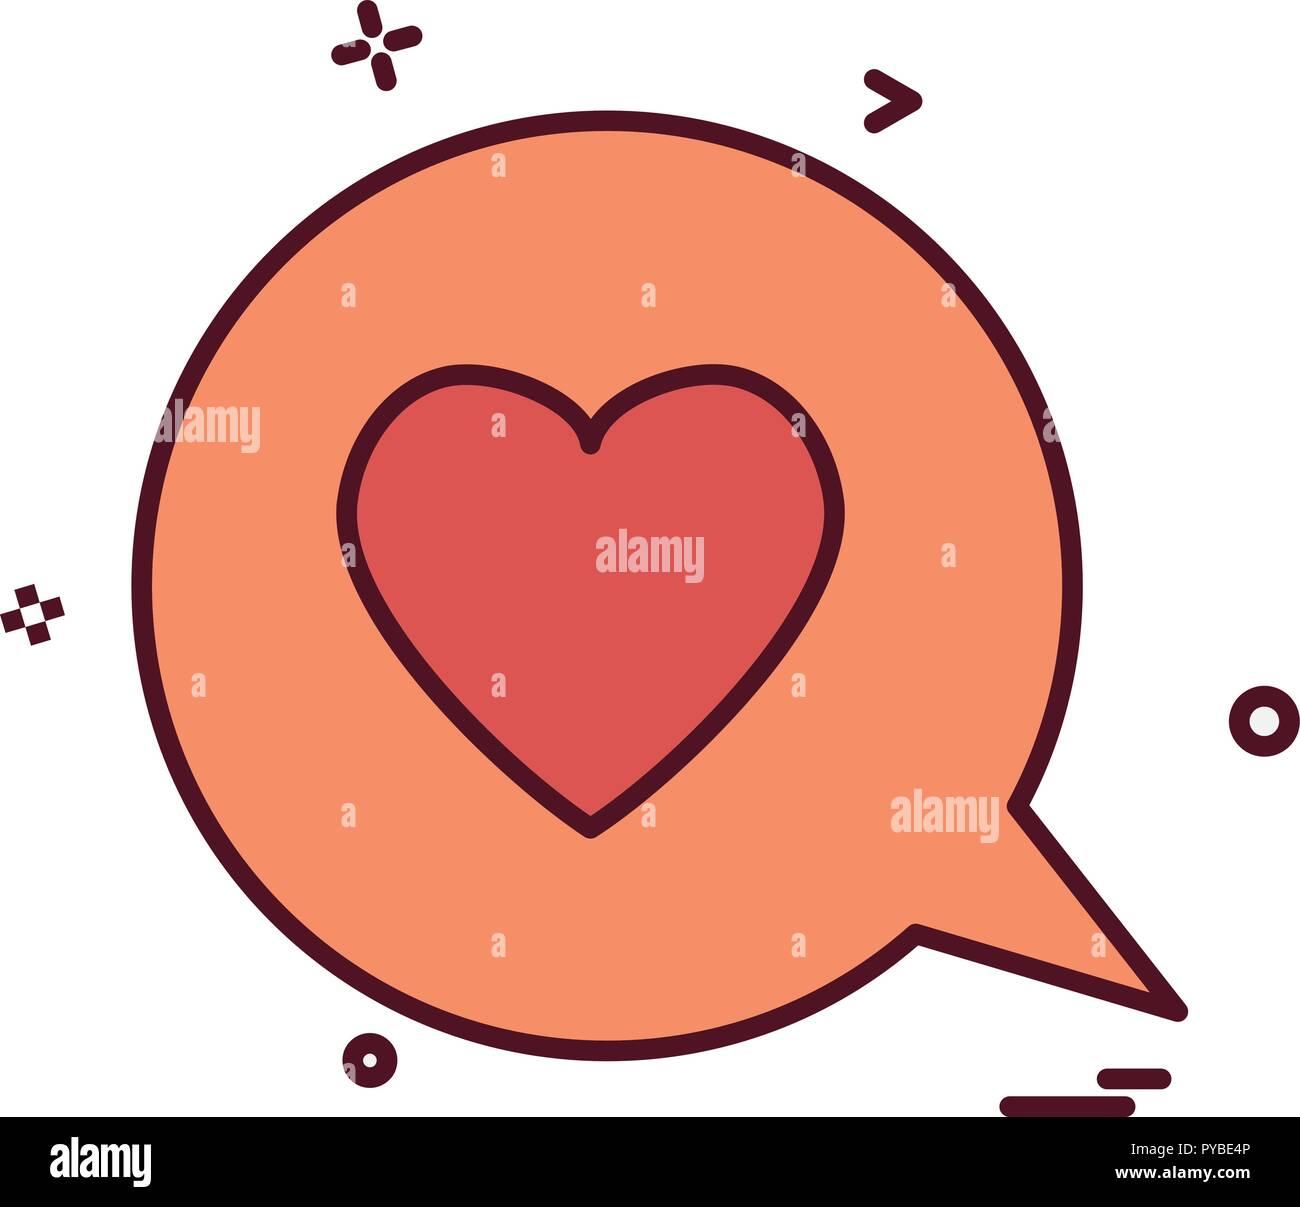 Valentine S Day Icon Design Vector Stock Vector Art Illustration